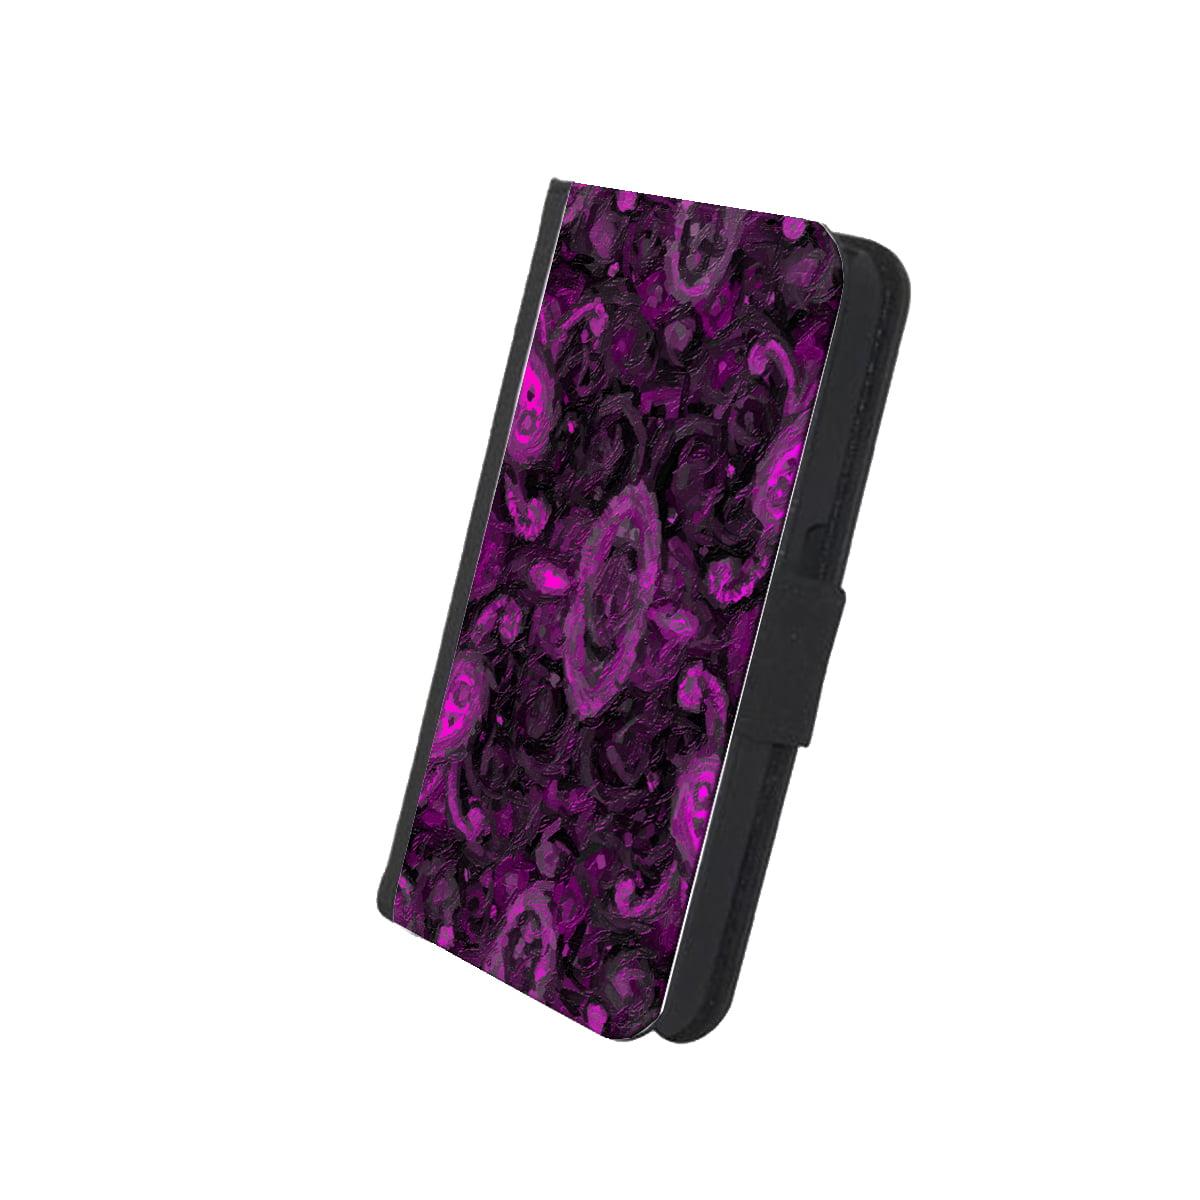 KuzmarK™ Samsung Galaxy S6 Wallet Case - Paisley Pink Painting